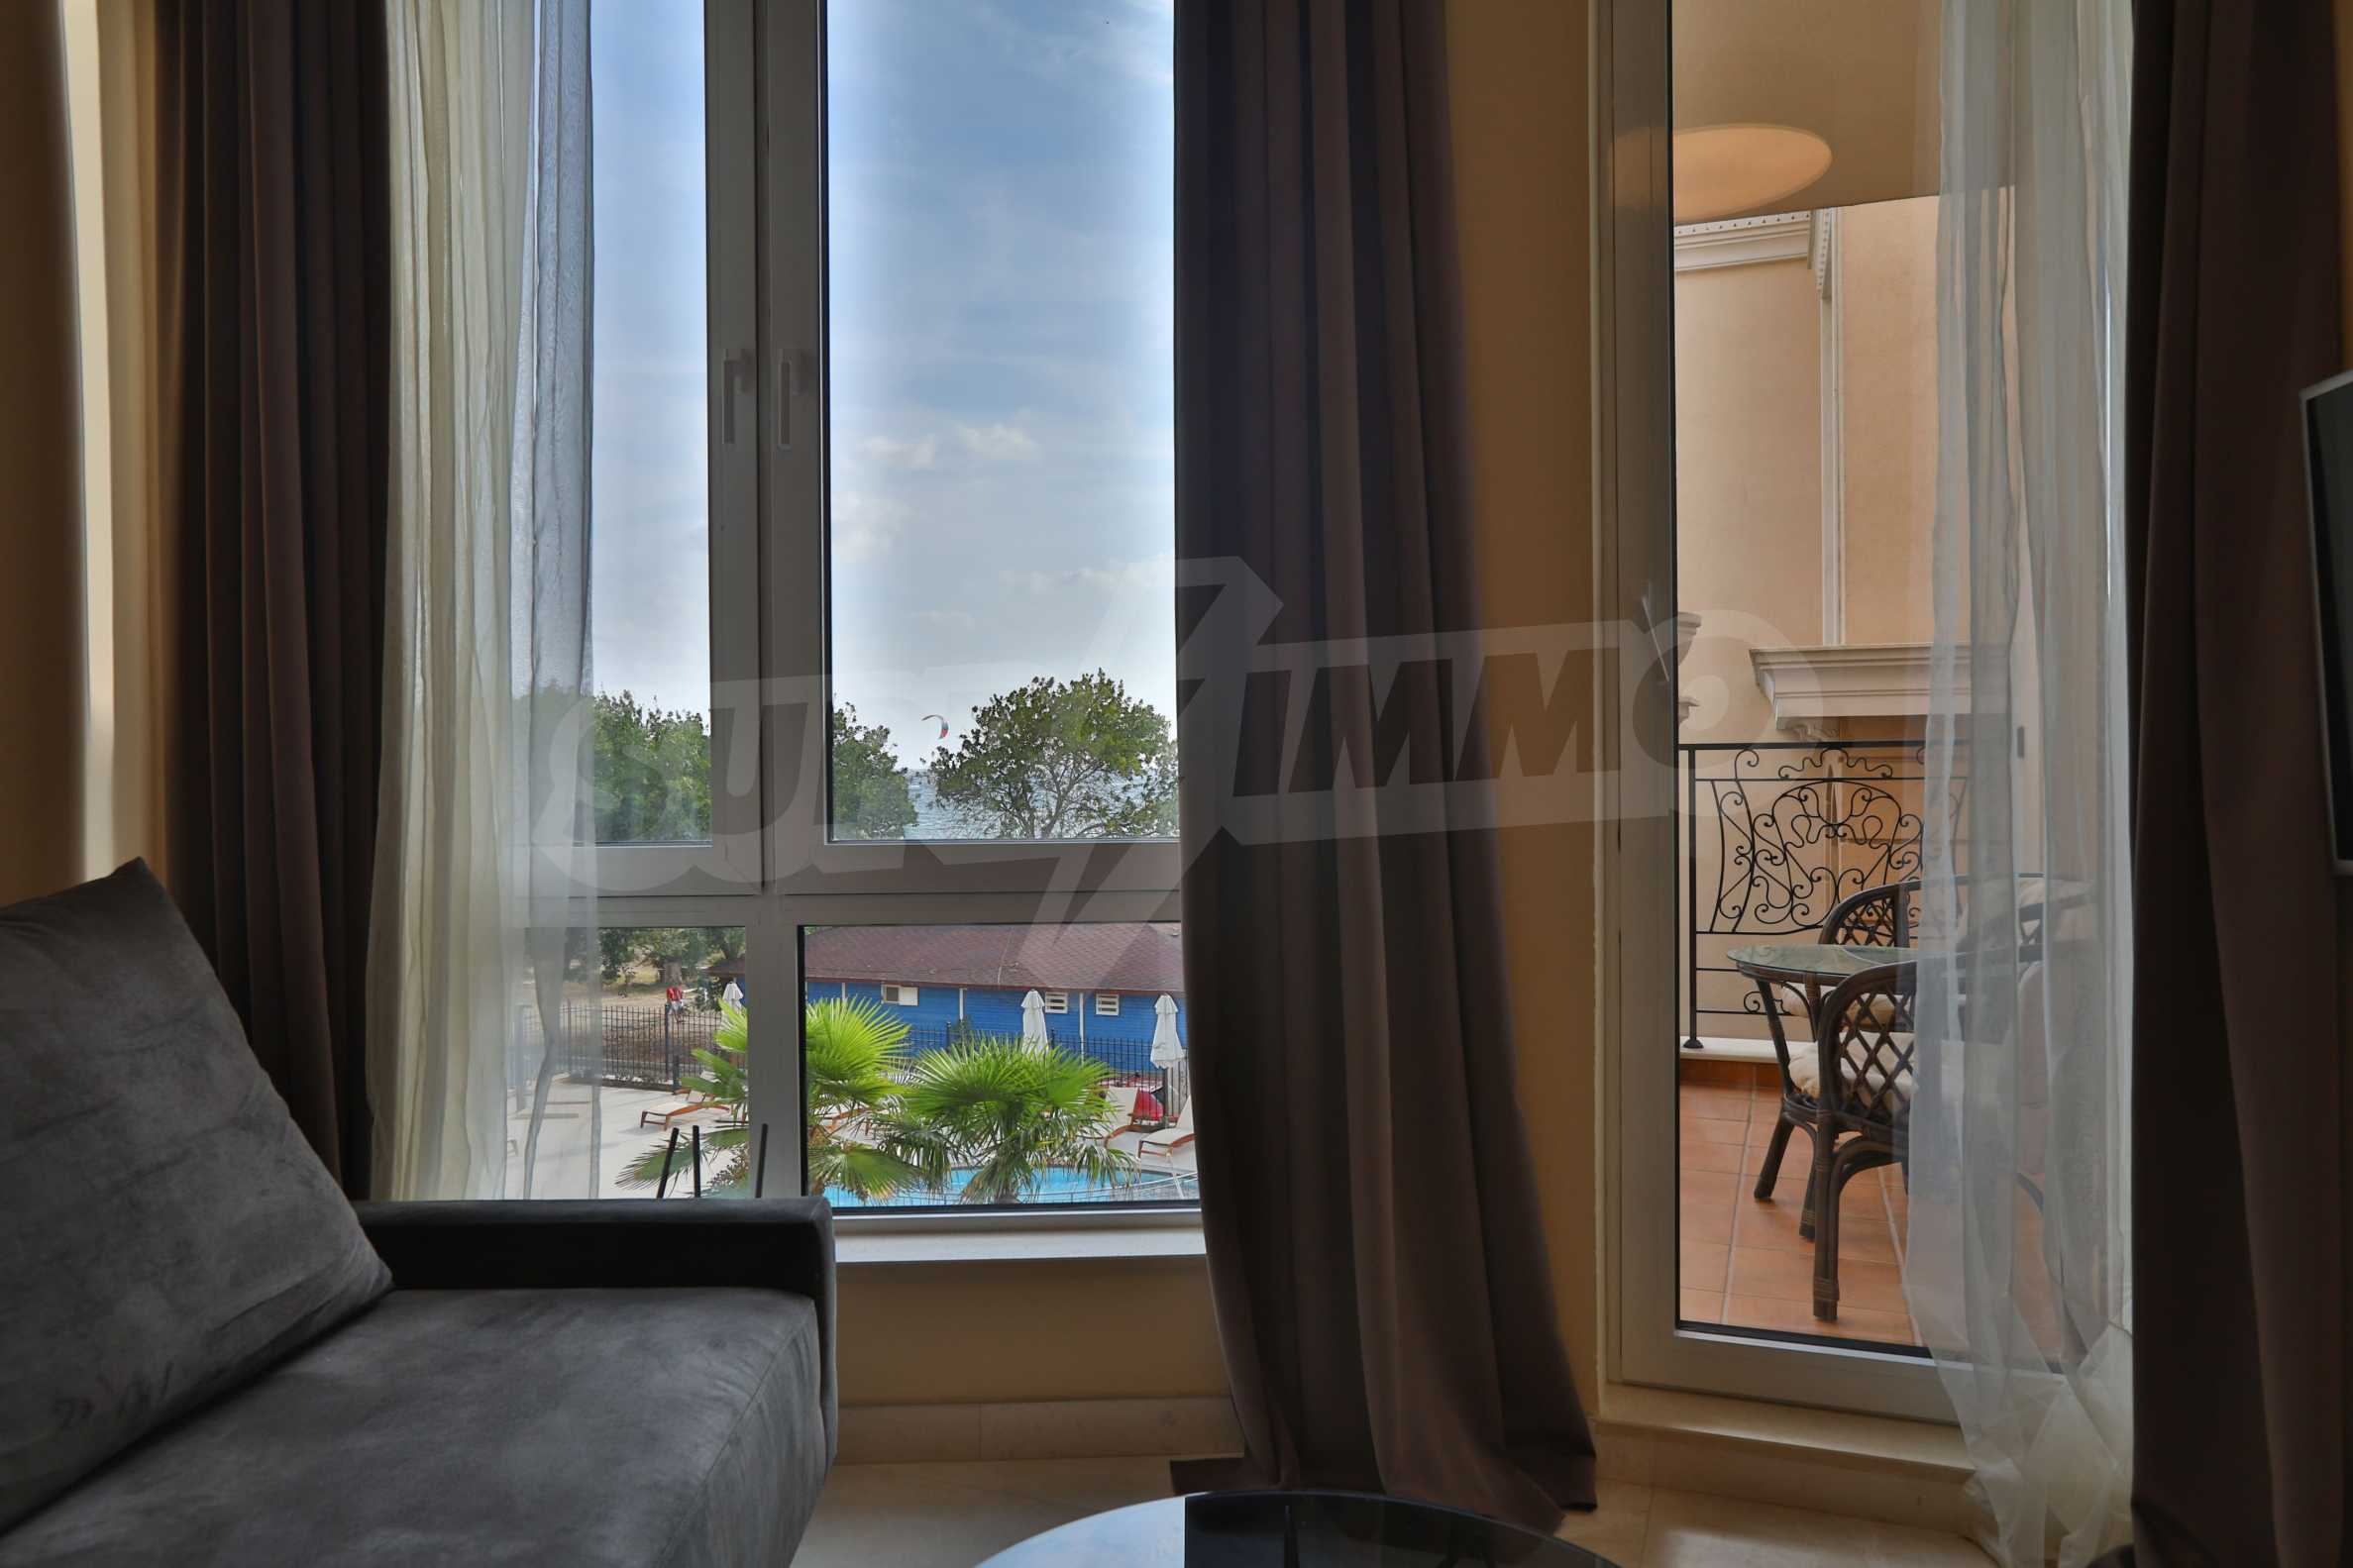 Дизайнерски тристаен апартамент под наем за летен сезон в резиденция Belle Époque в Лозенец 9